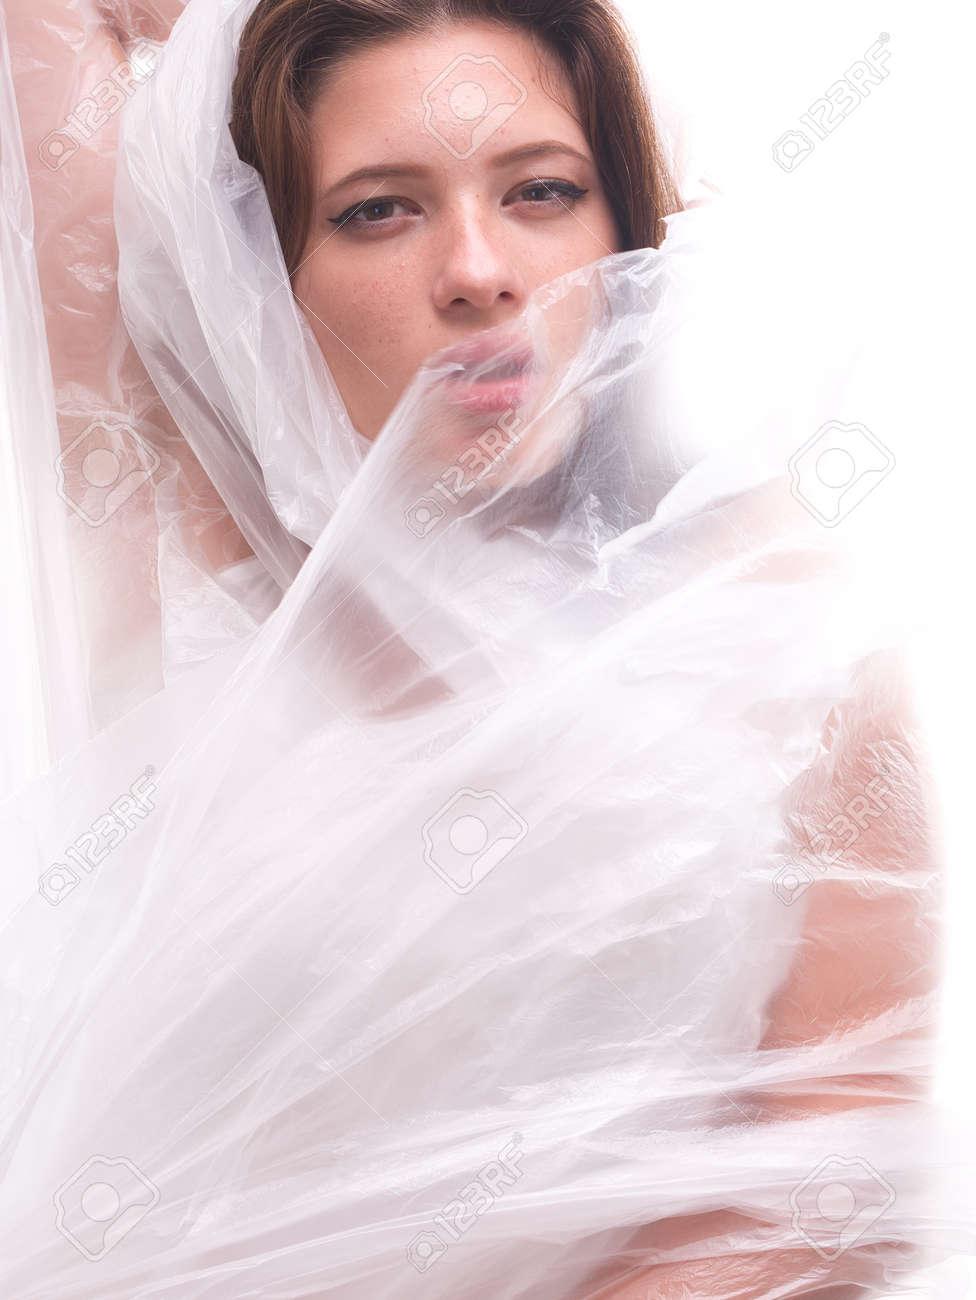 high key. Conceptual portrait with plastic sheets. One young woman strugling with plastic sheets. - 164118909